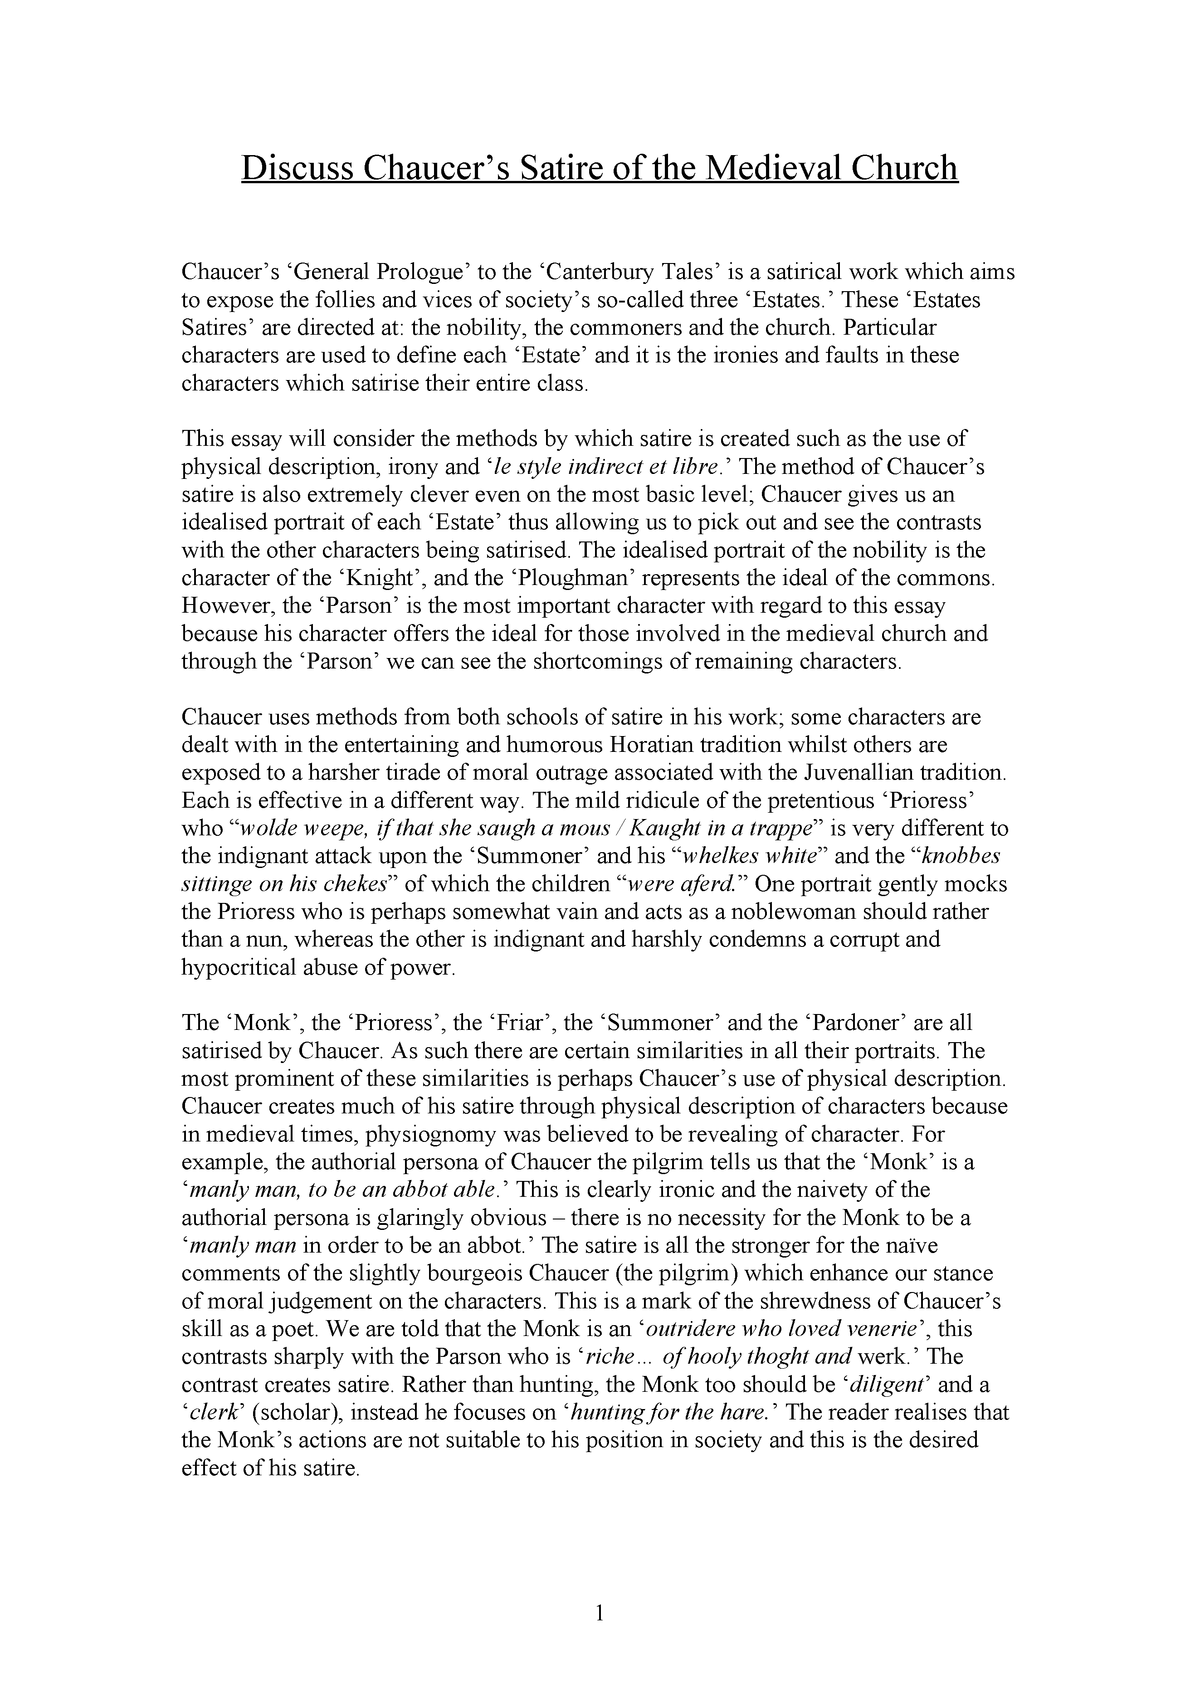 Chaucer Medieval Church Satire - 64021034: Literatura Inglesa I